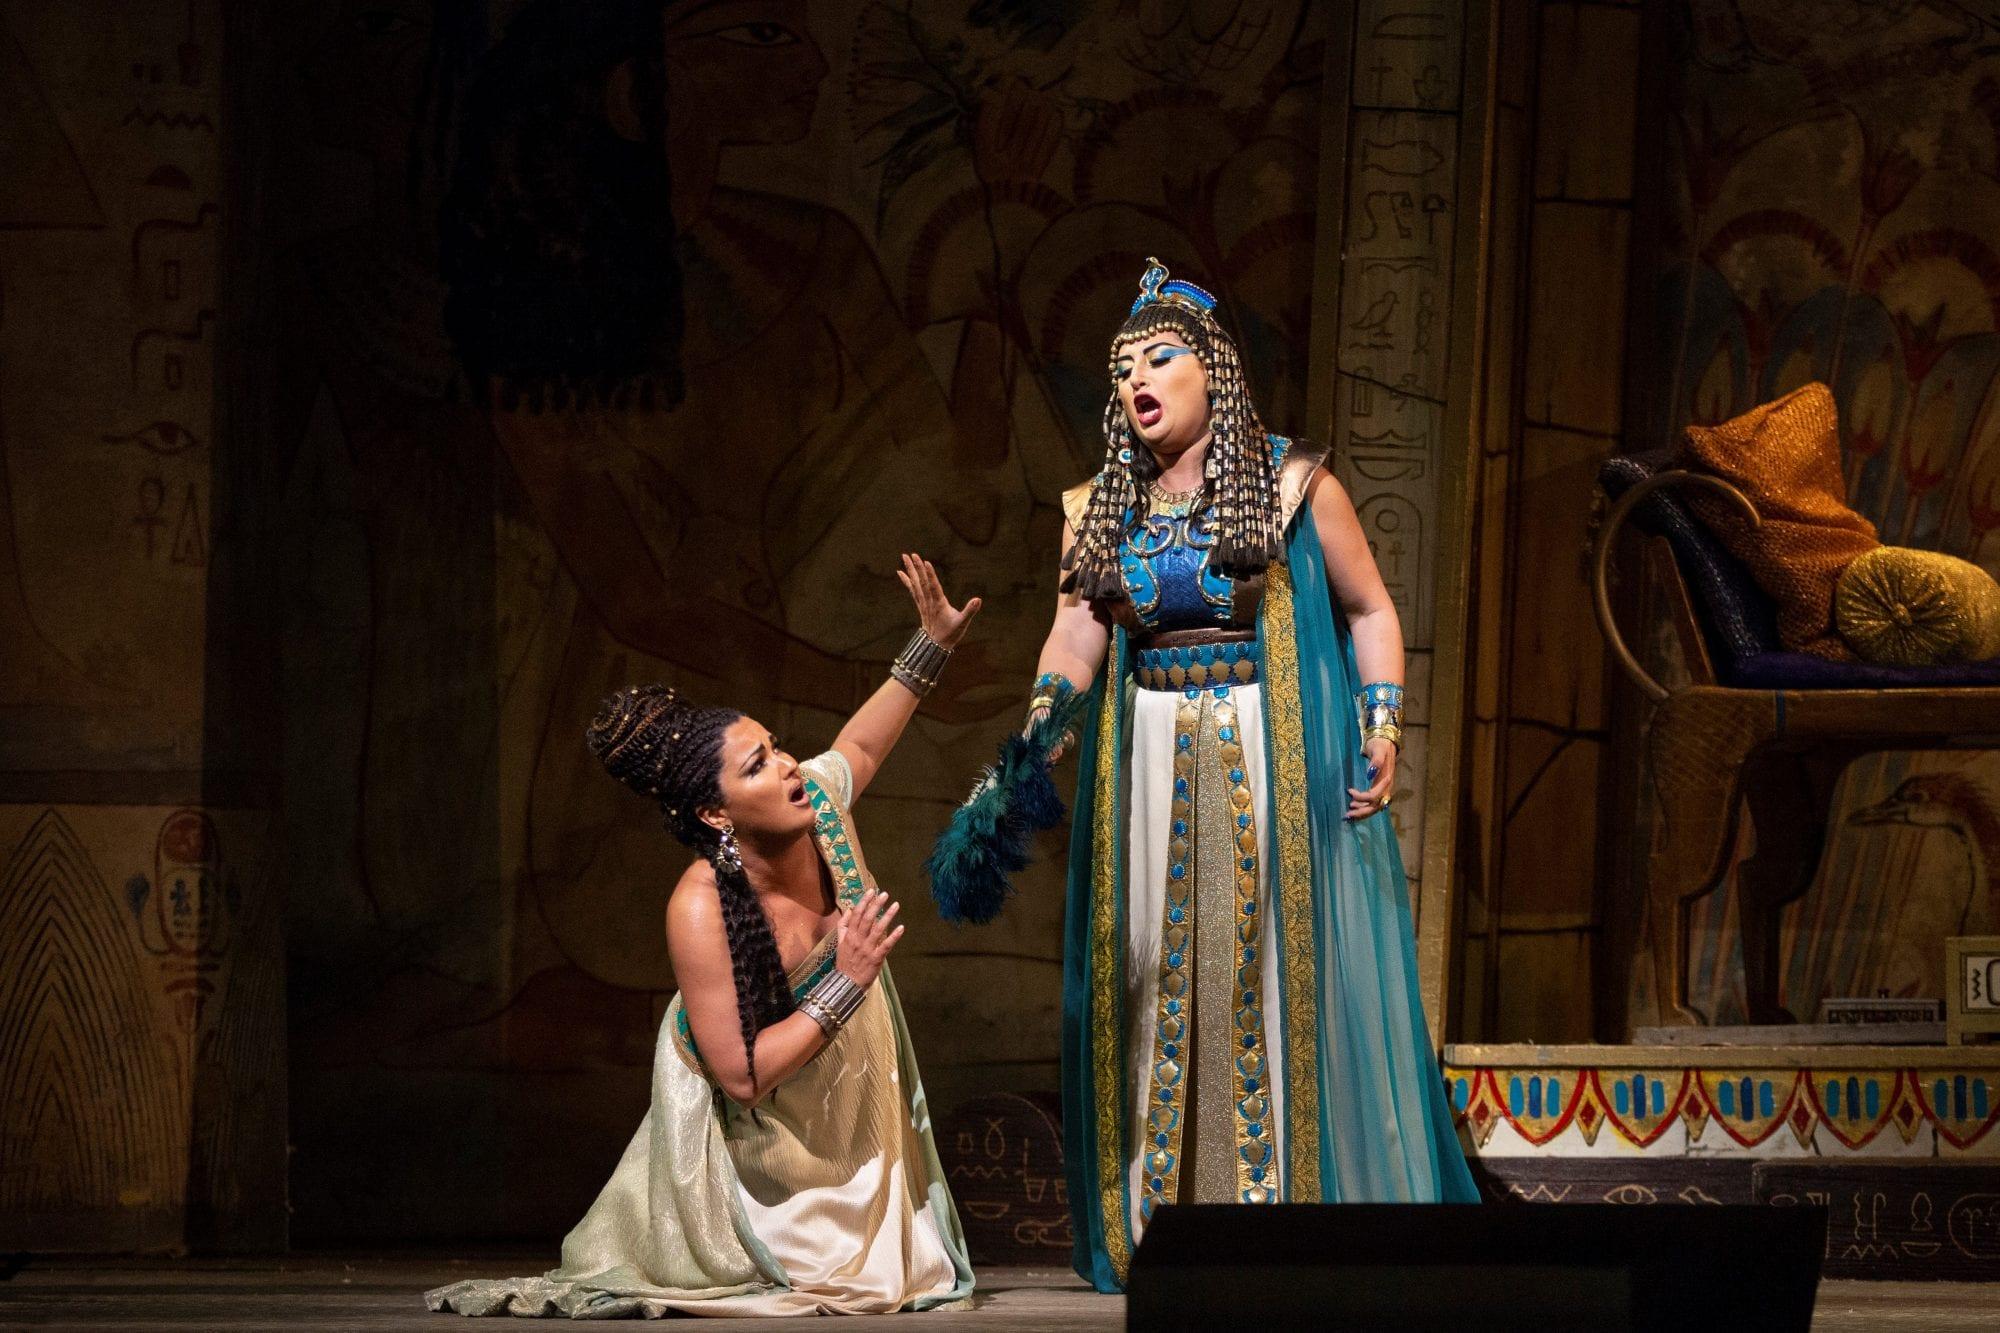 Aida 1872